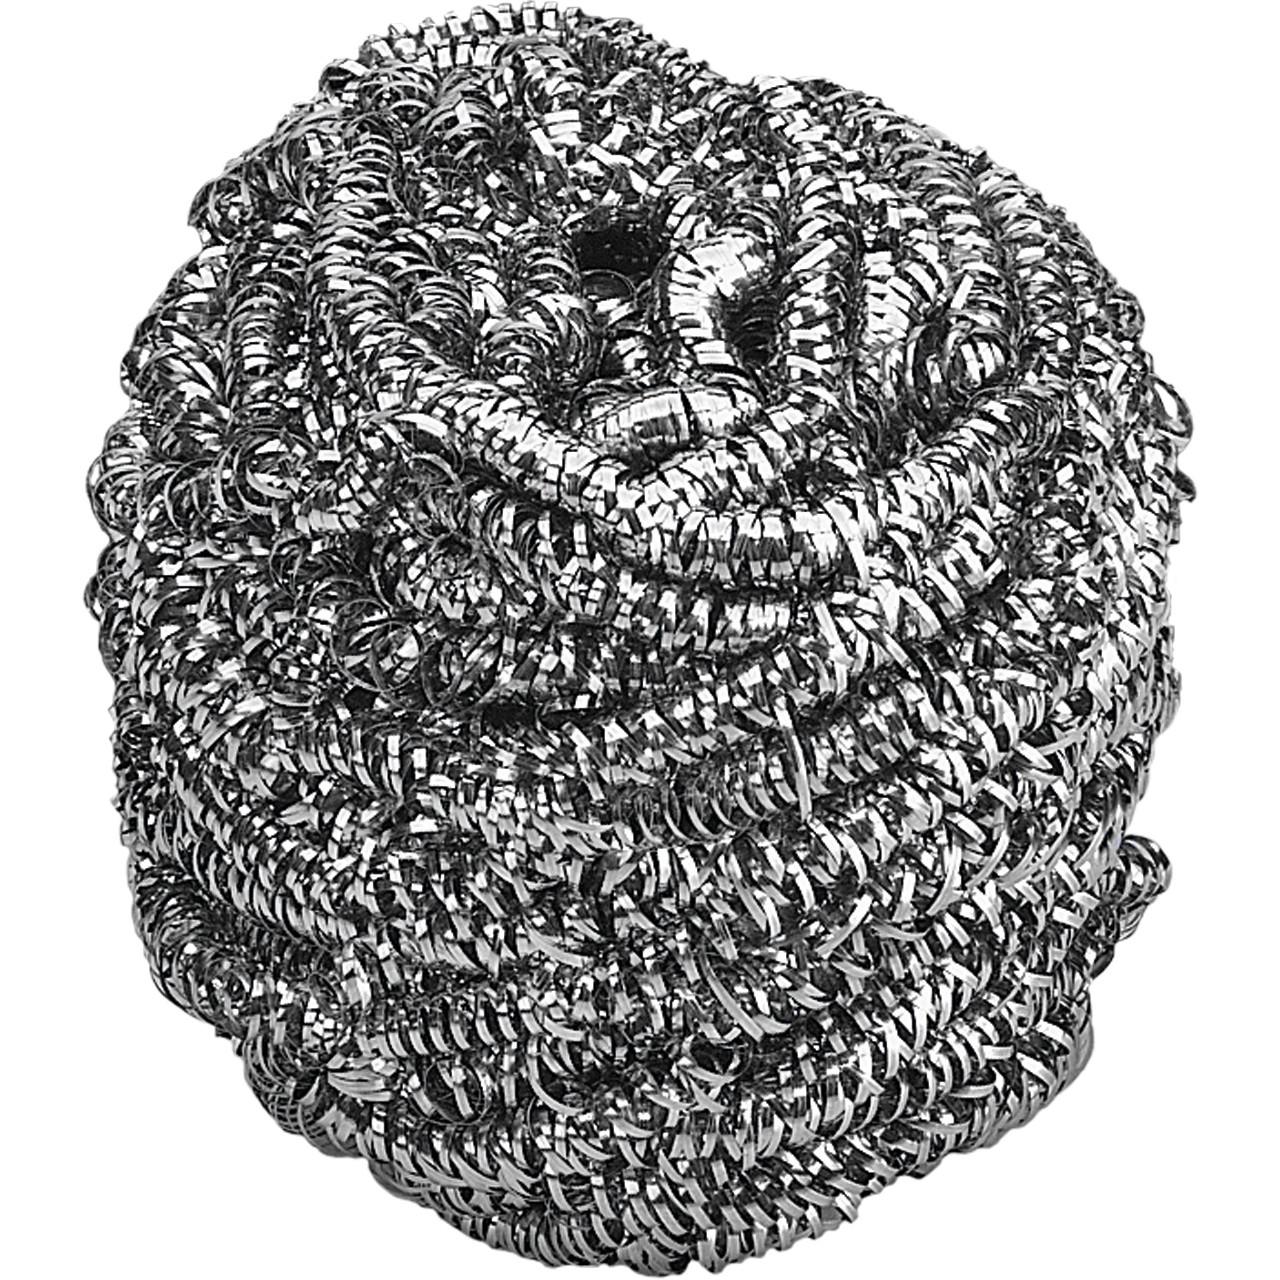 Fregall acer inox Pla 40gr